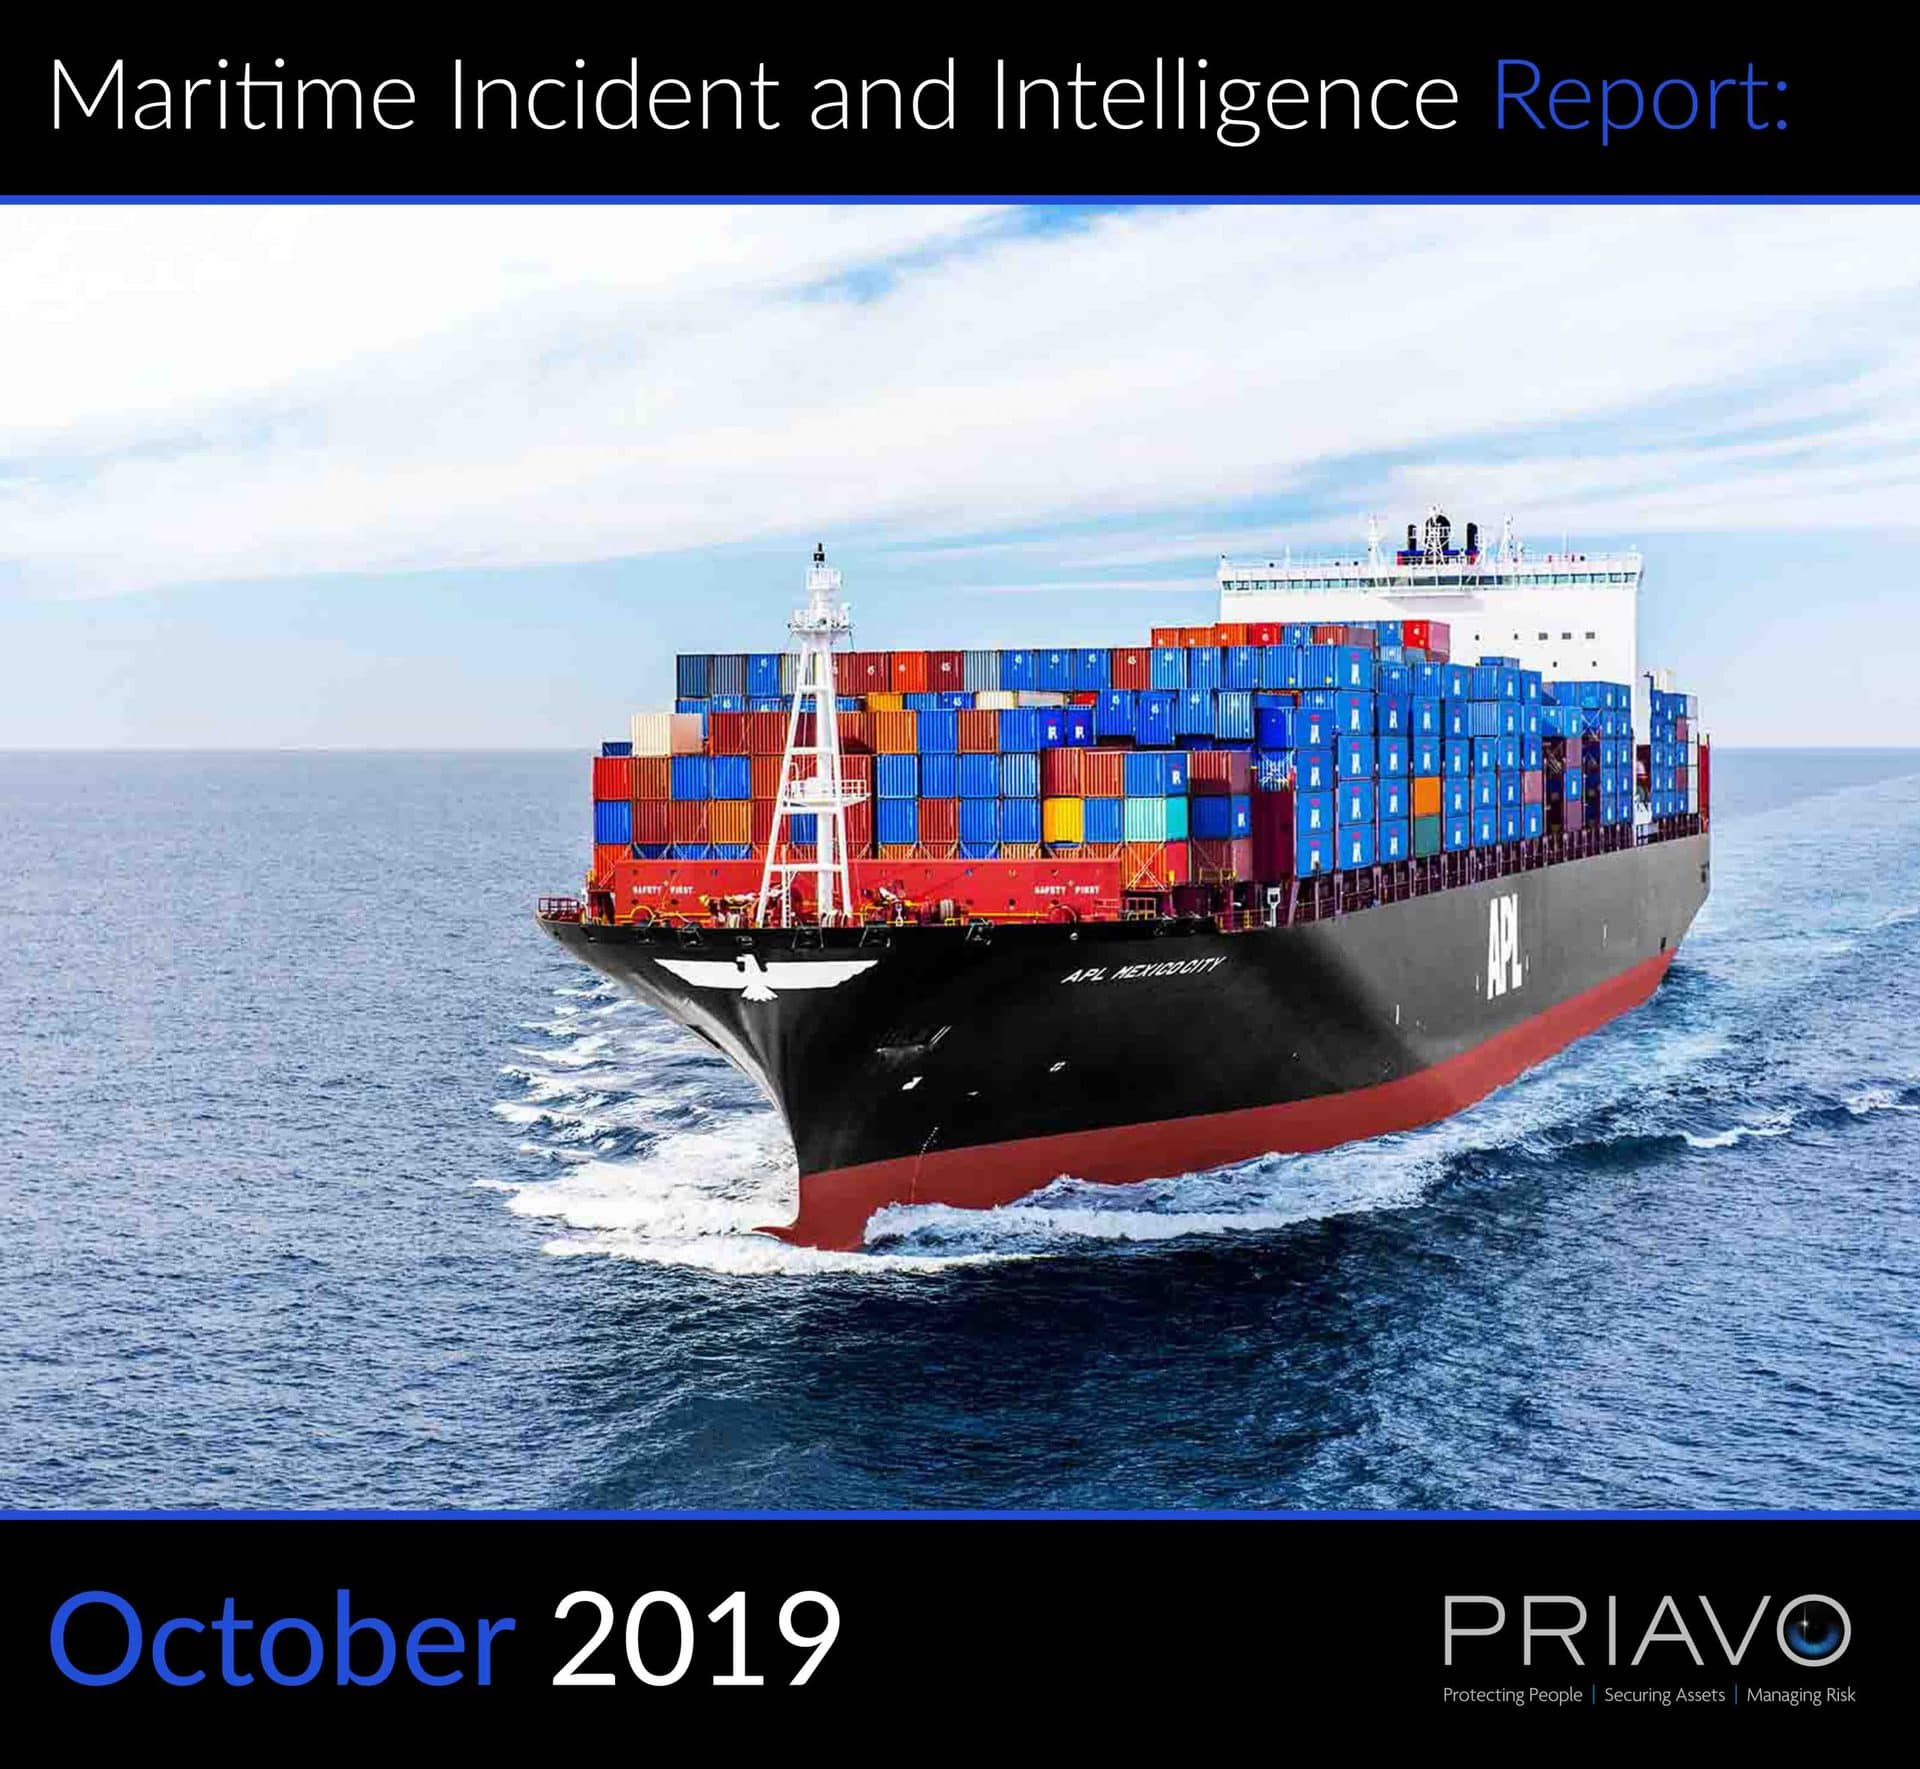 Maritime Incident Report: October 2019